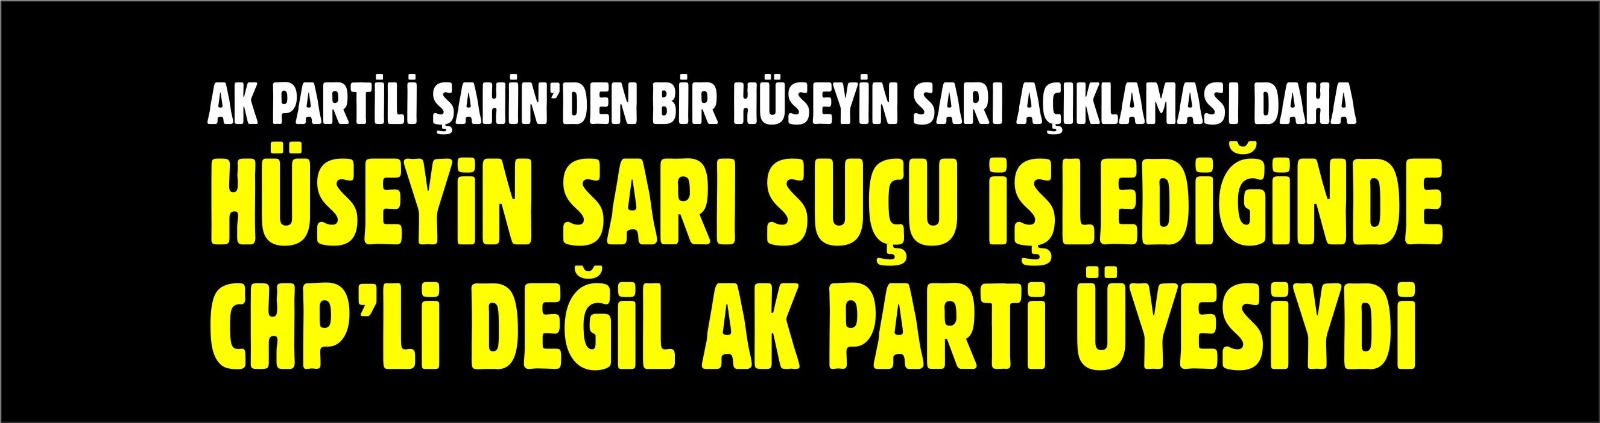 """İHALEYE FESAT SUÇU İŞLENDİĞİNDE AK PARTİ ÜYESİYDİ"""